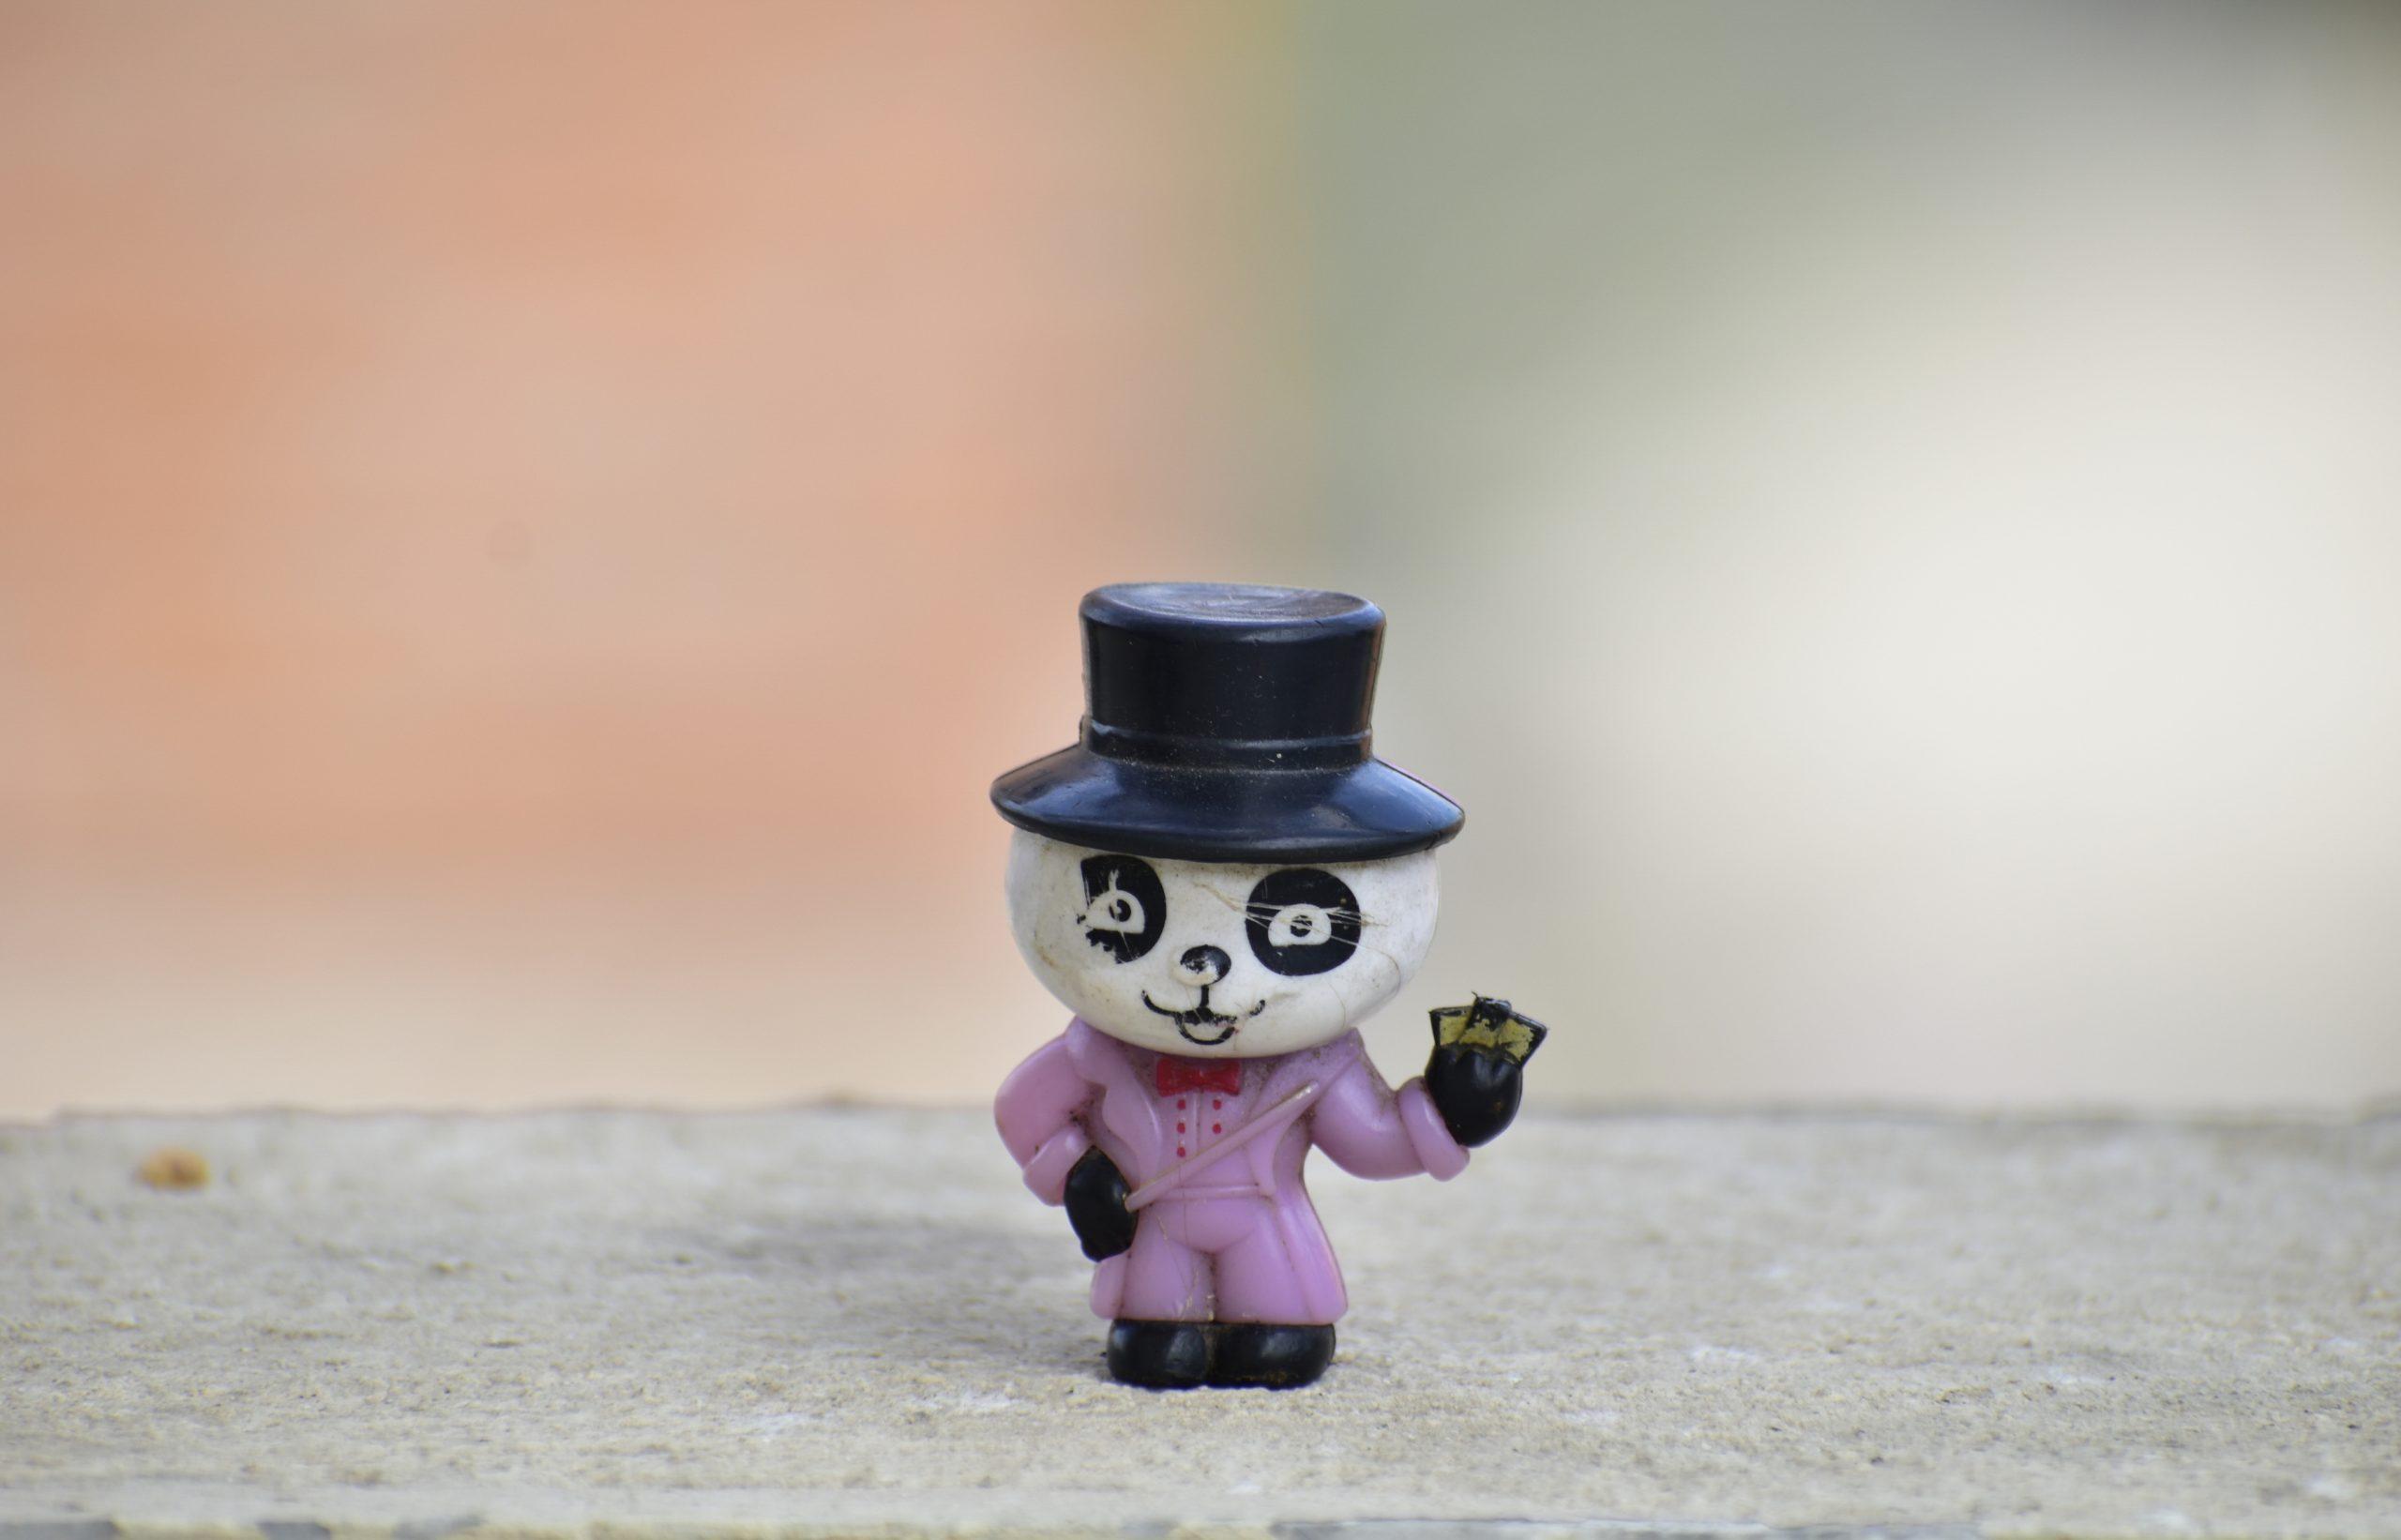 Miniature toy